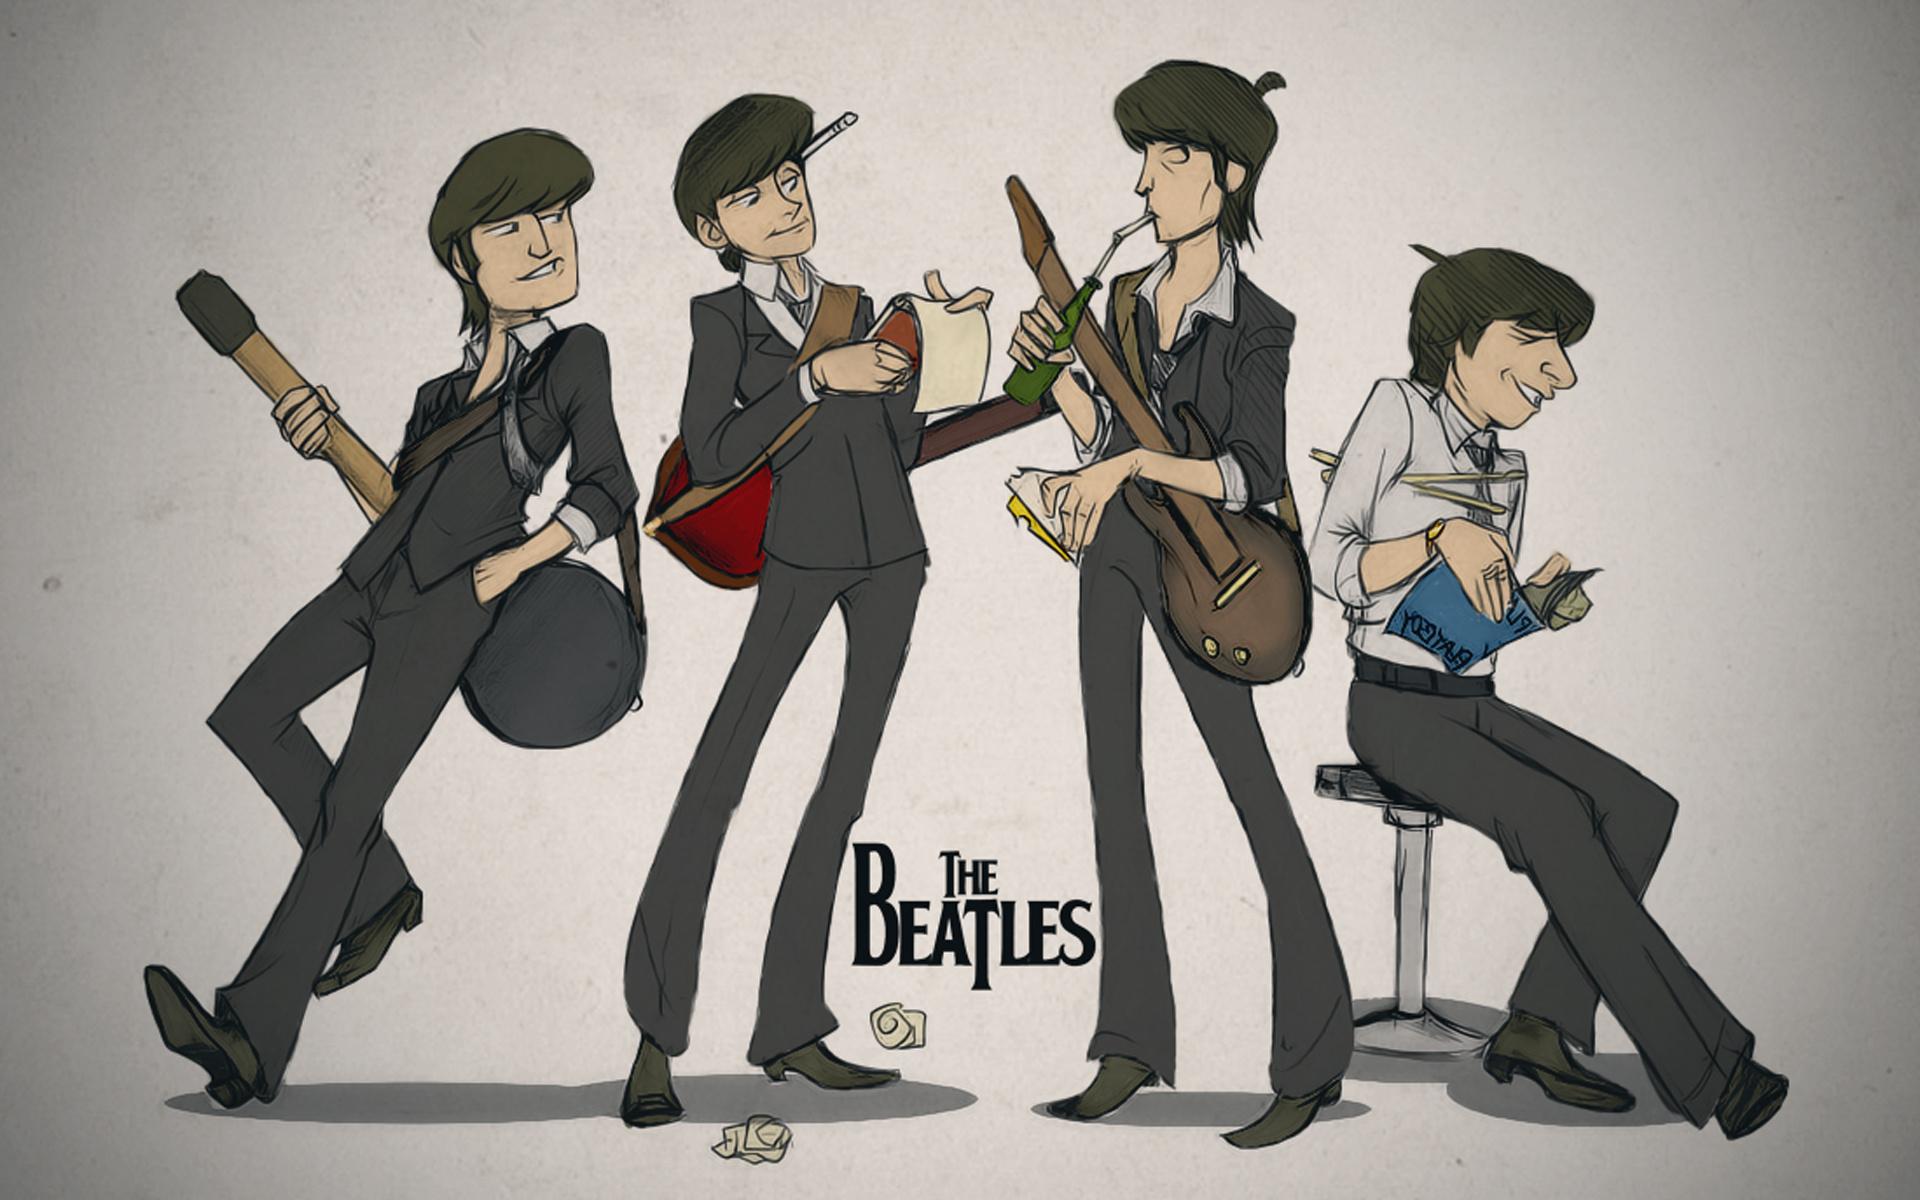 Wallpaper Illustration Anime Cartoon Musician The Beatles Ringo Starr Guitarist John Lennon Paul Mccartney George Harrison Art 1920x1200 Coolwallpapers 579485 Hd Wallpapers Wallhere